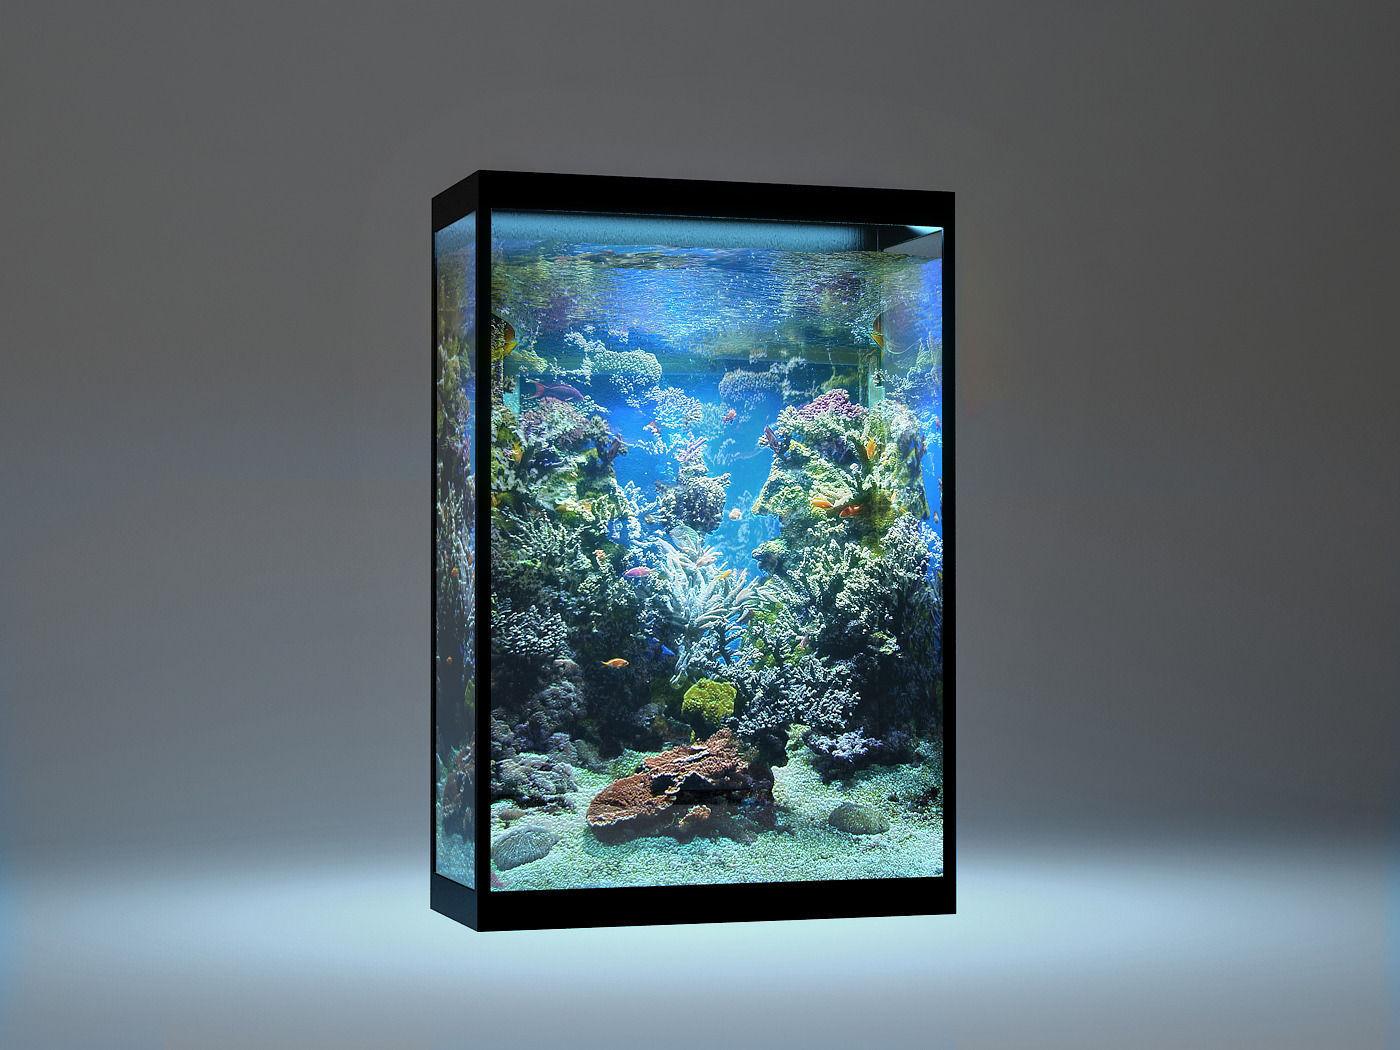 15 Desain Contoh Model Aquarium Minimalis | RUMAH IMPIAN